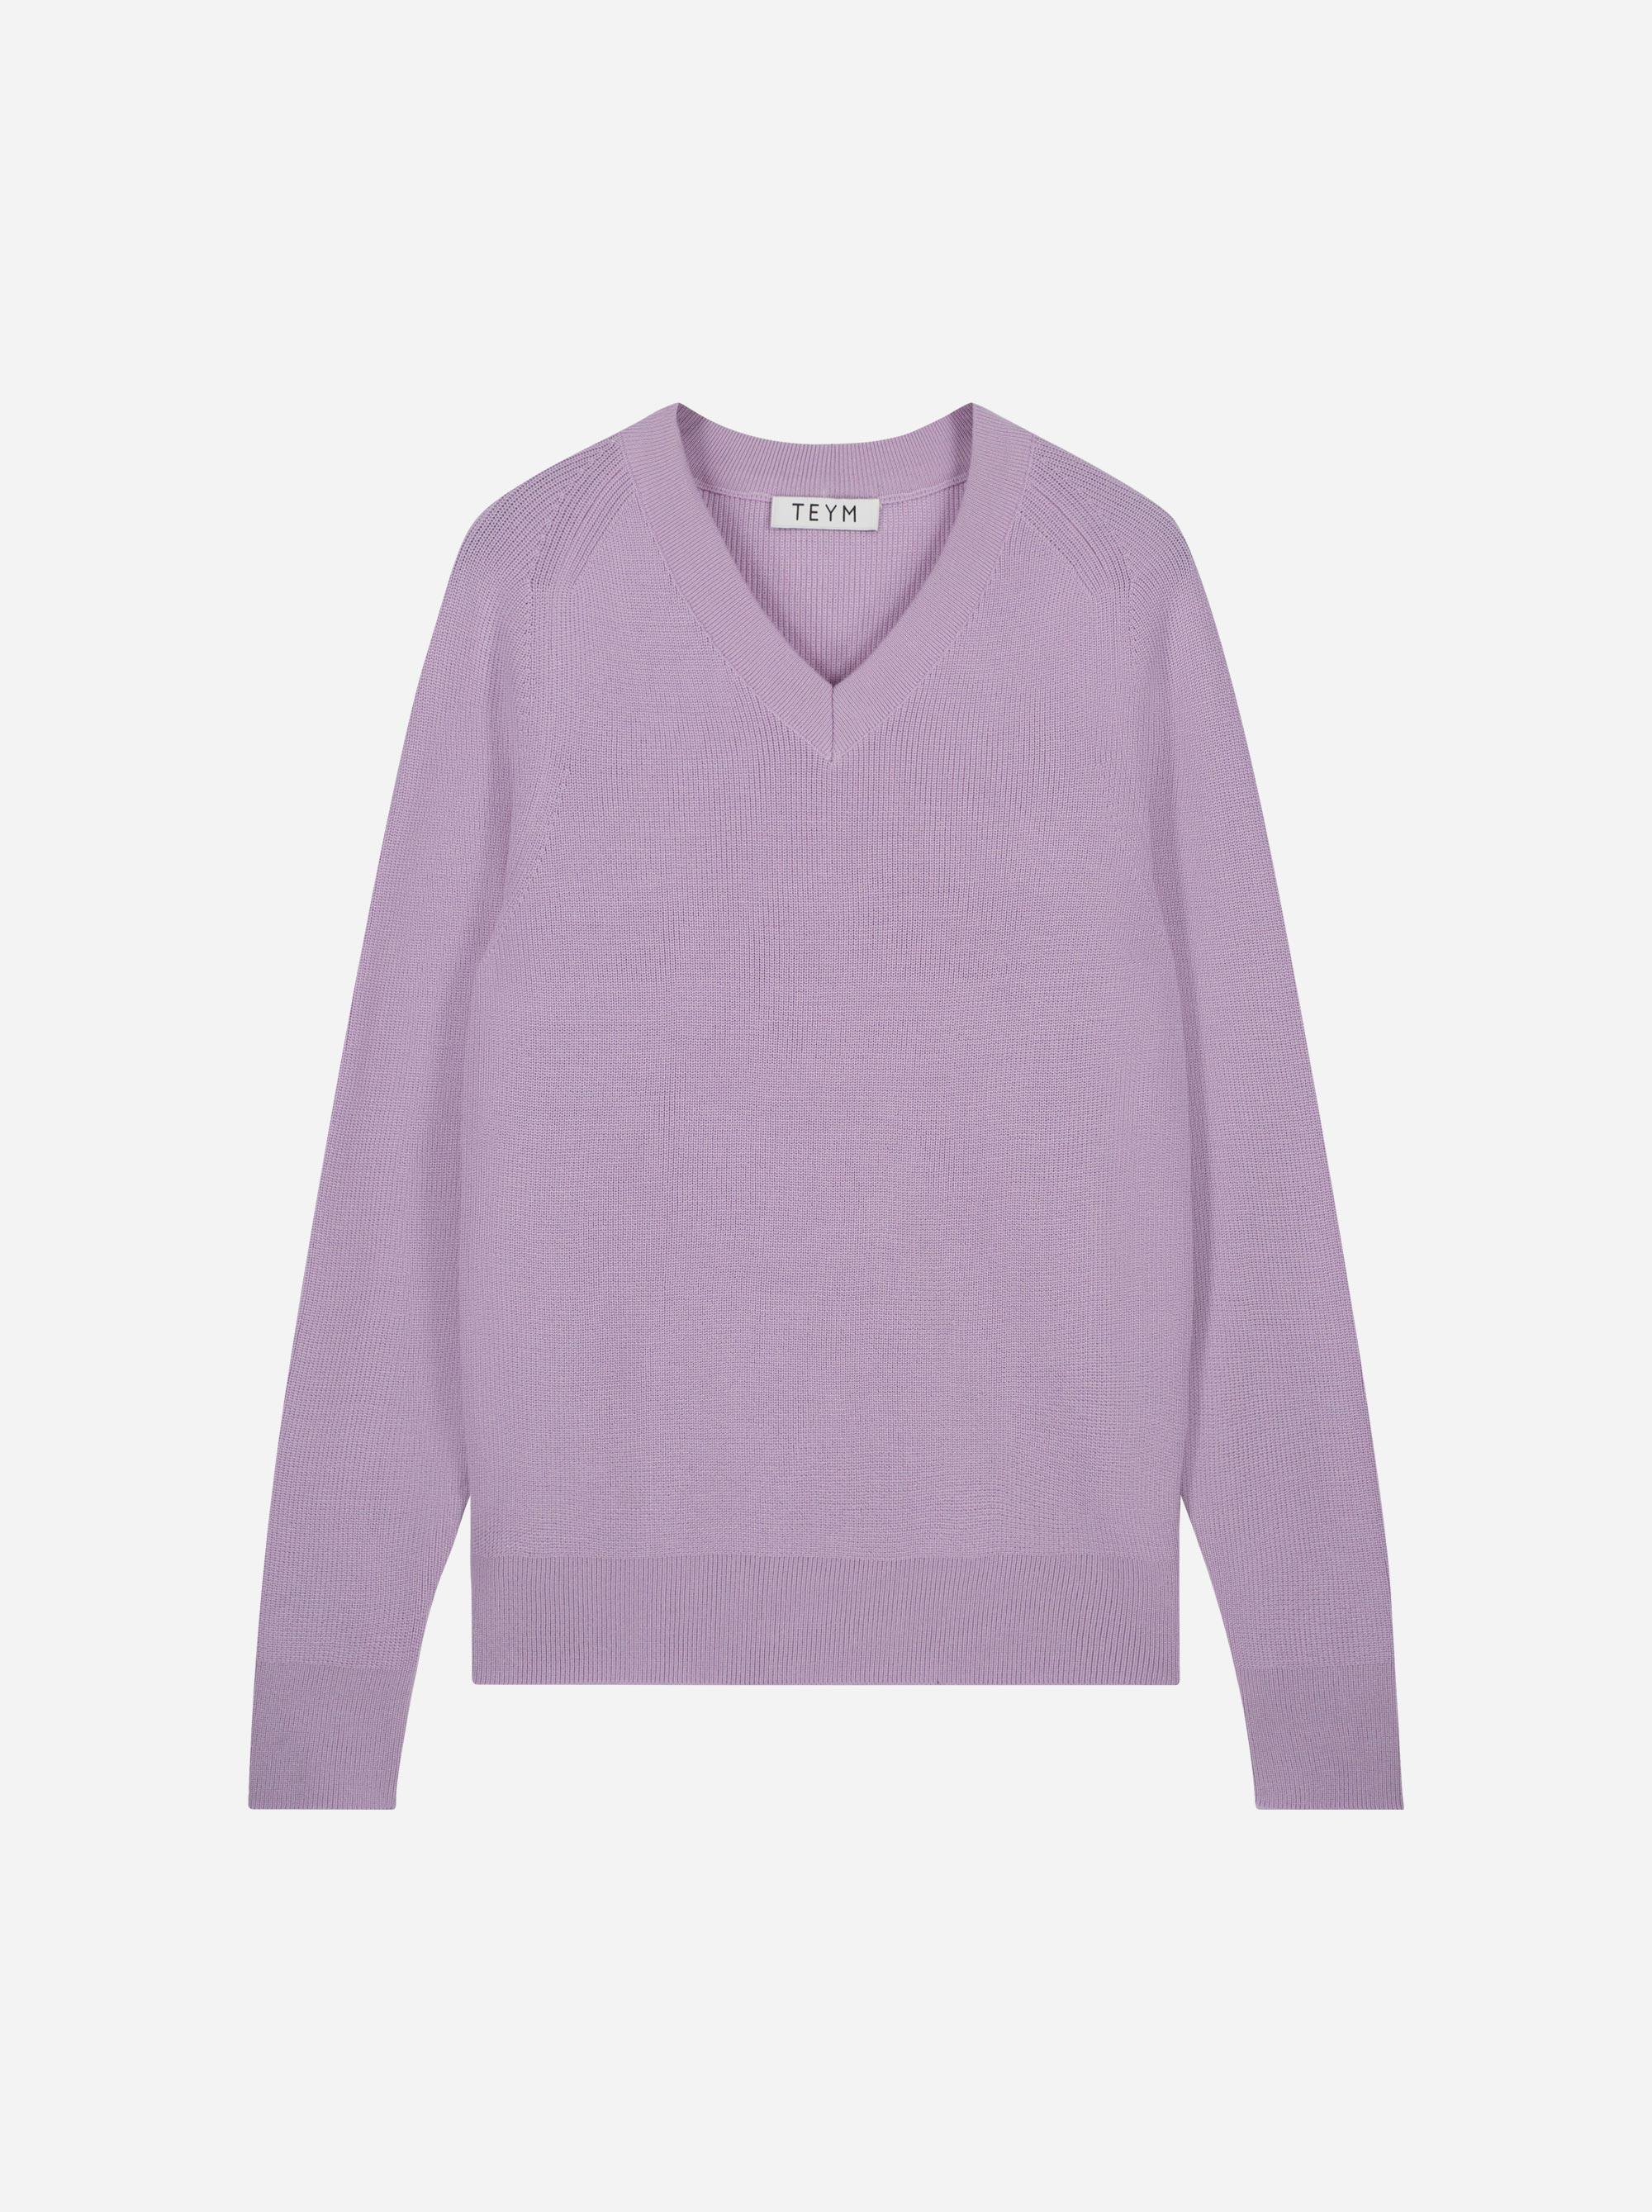 Teym_Merino-Sweater-V-Neck_Lila_front_1